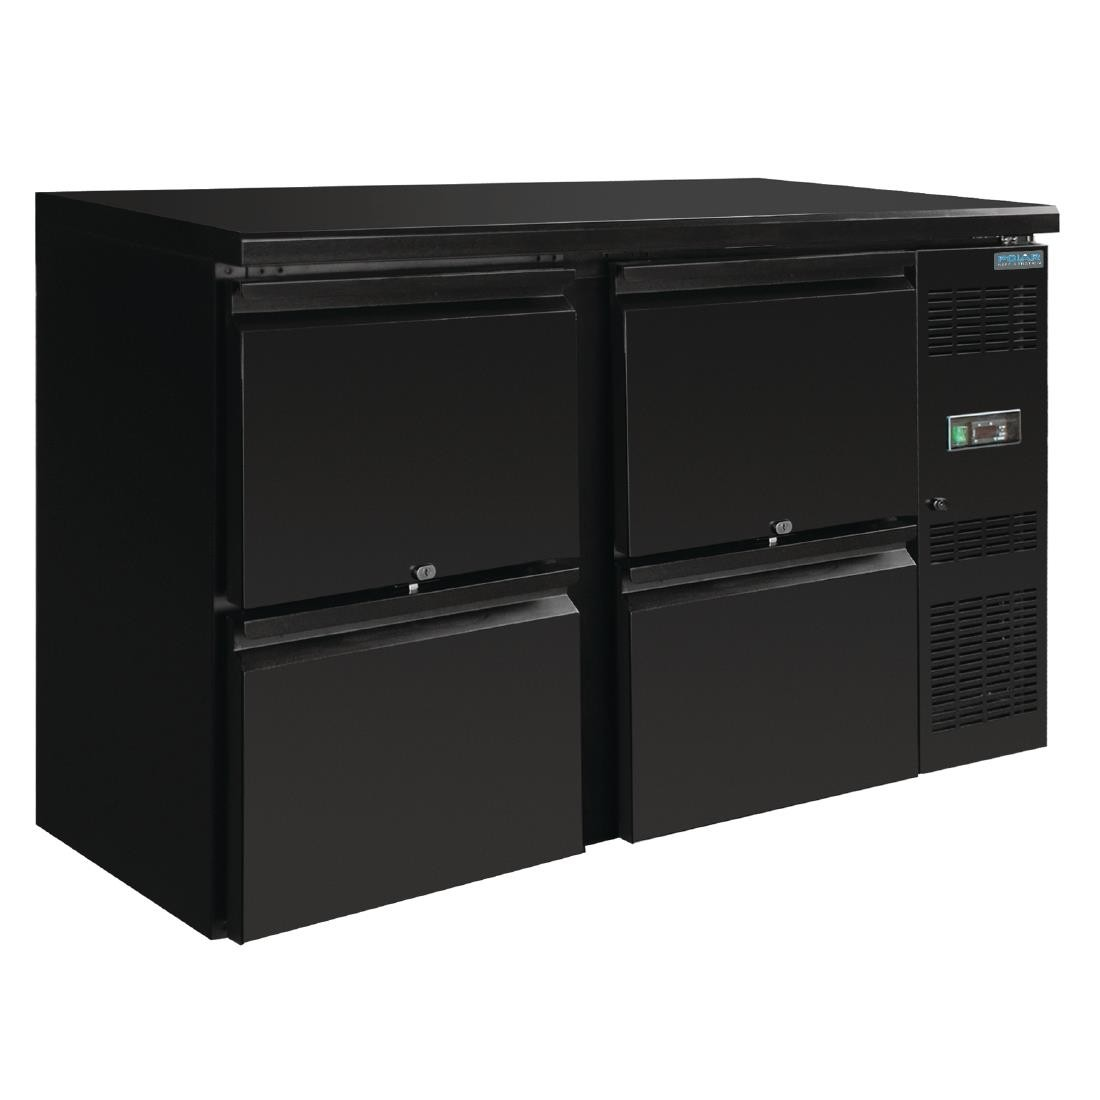 Polar GL455 U-Series Four Drawer Back Bar Counter Fridge